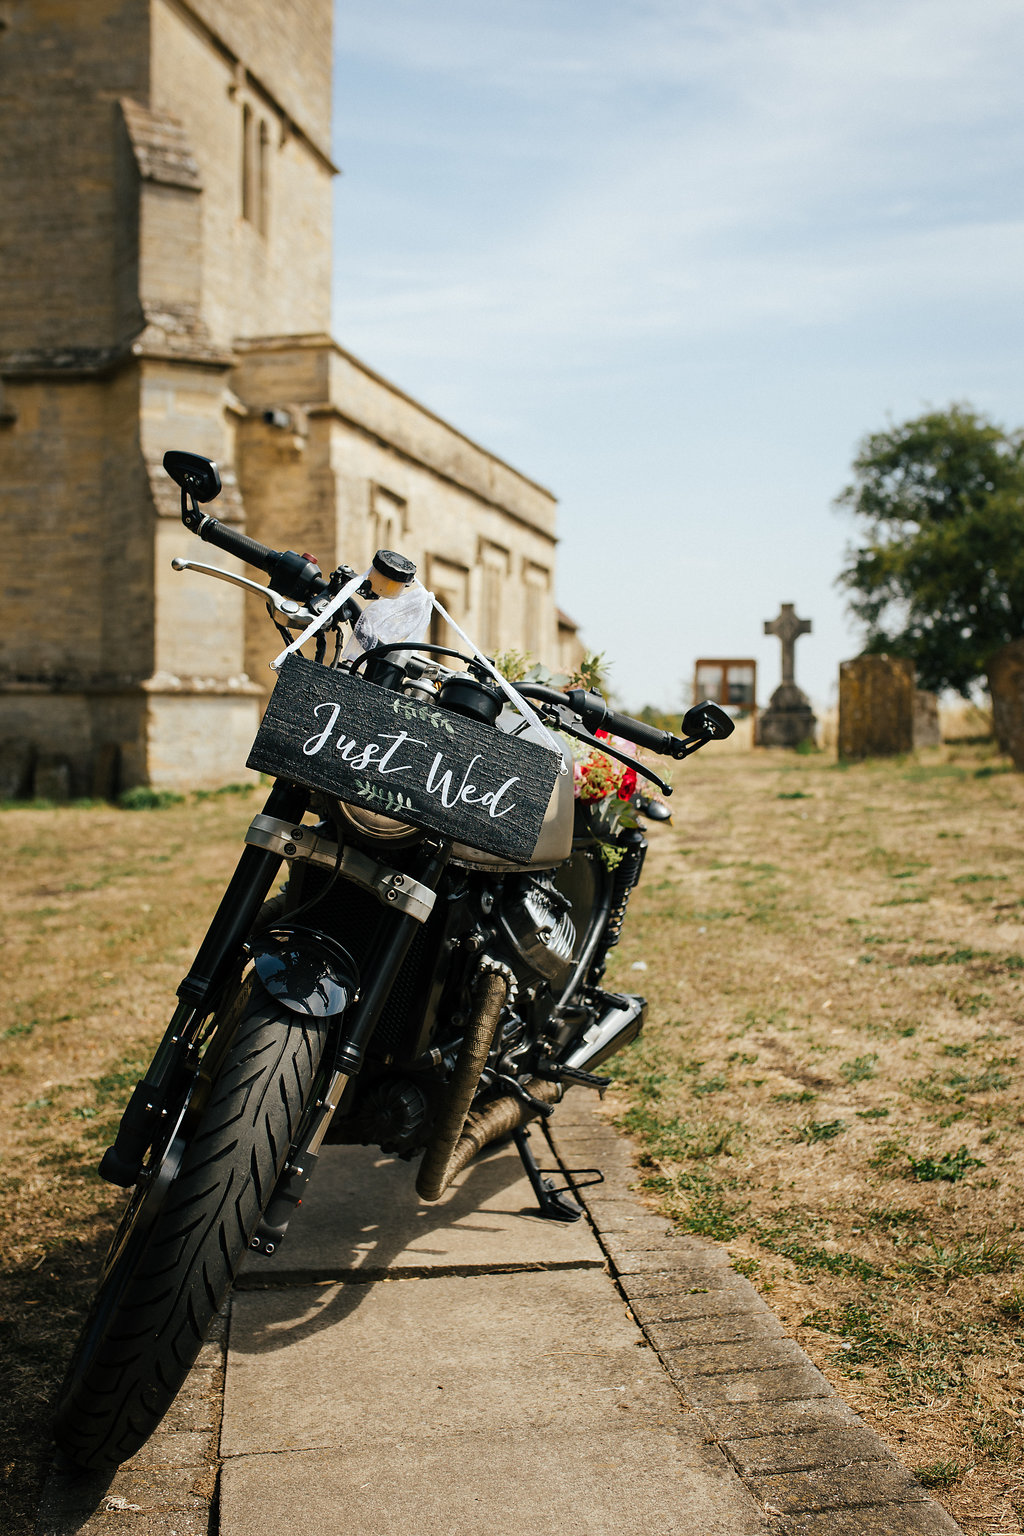 Vintage wedding motorbike